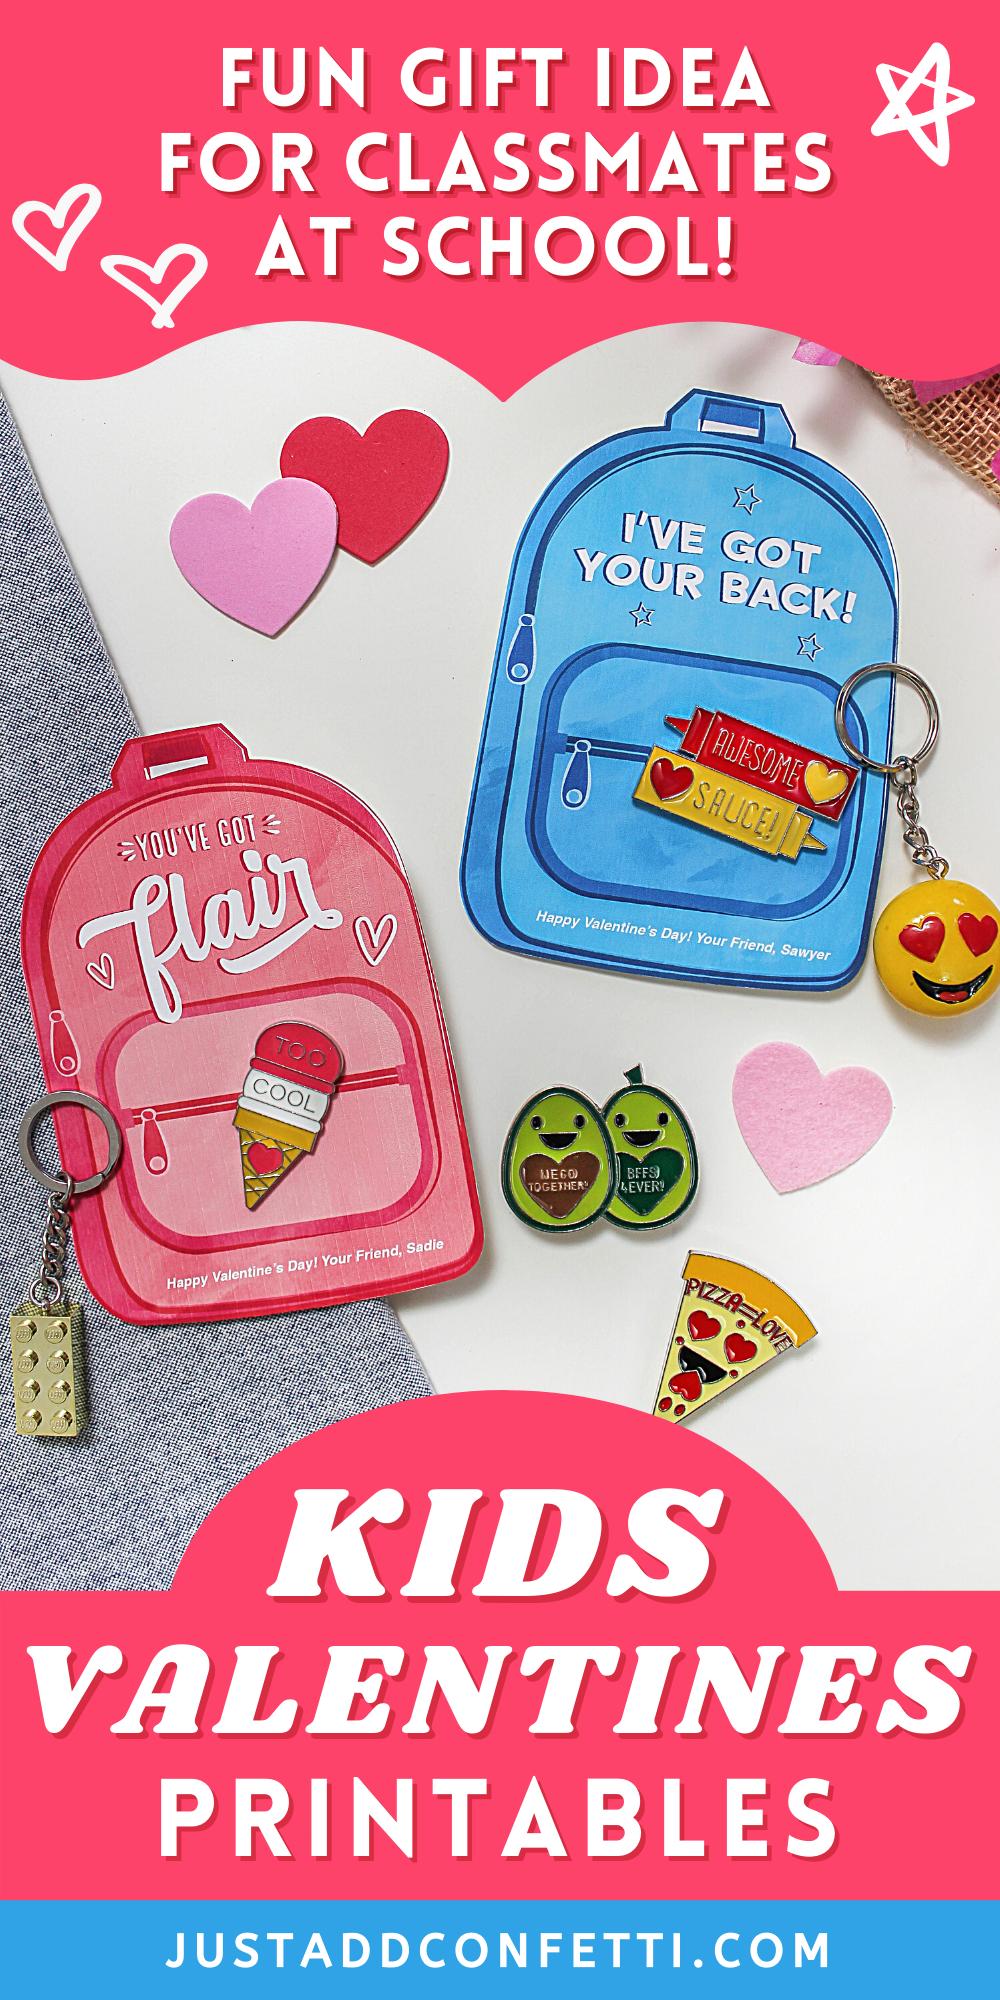 """You've Got Flair"" Backpack Kids Valentine, kids valentine, backpack, school valentine, I've got your back, classroom valentine, keychain valentine, enamel pin valentine, Etsy shop, Just Add Confetti, printable valentine"